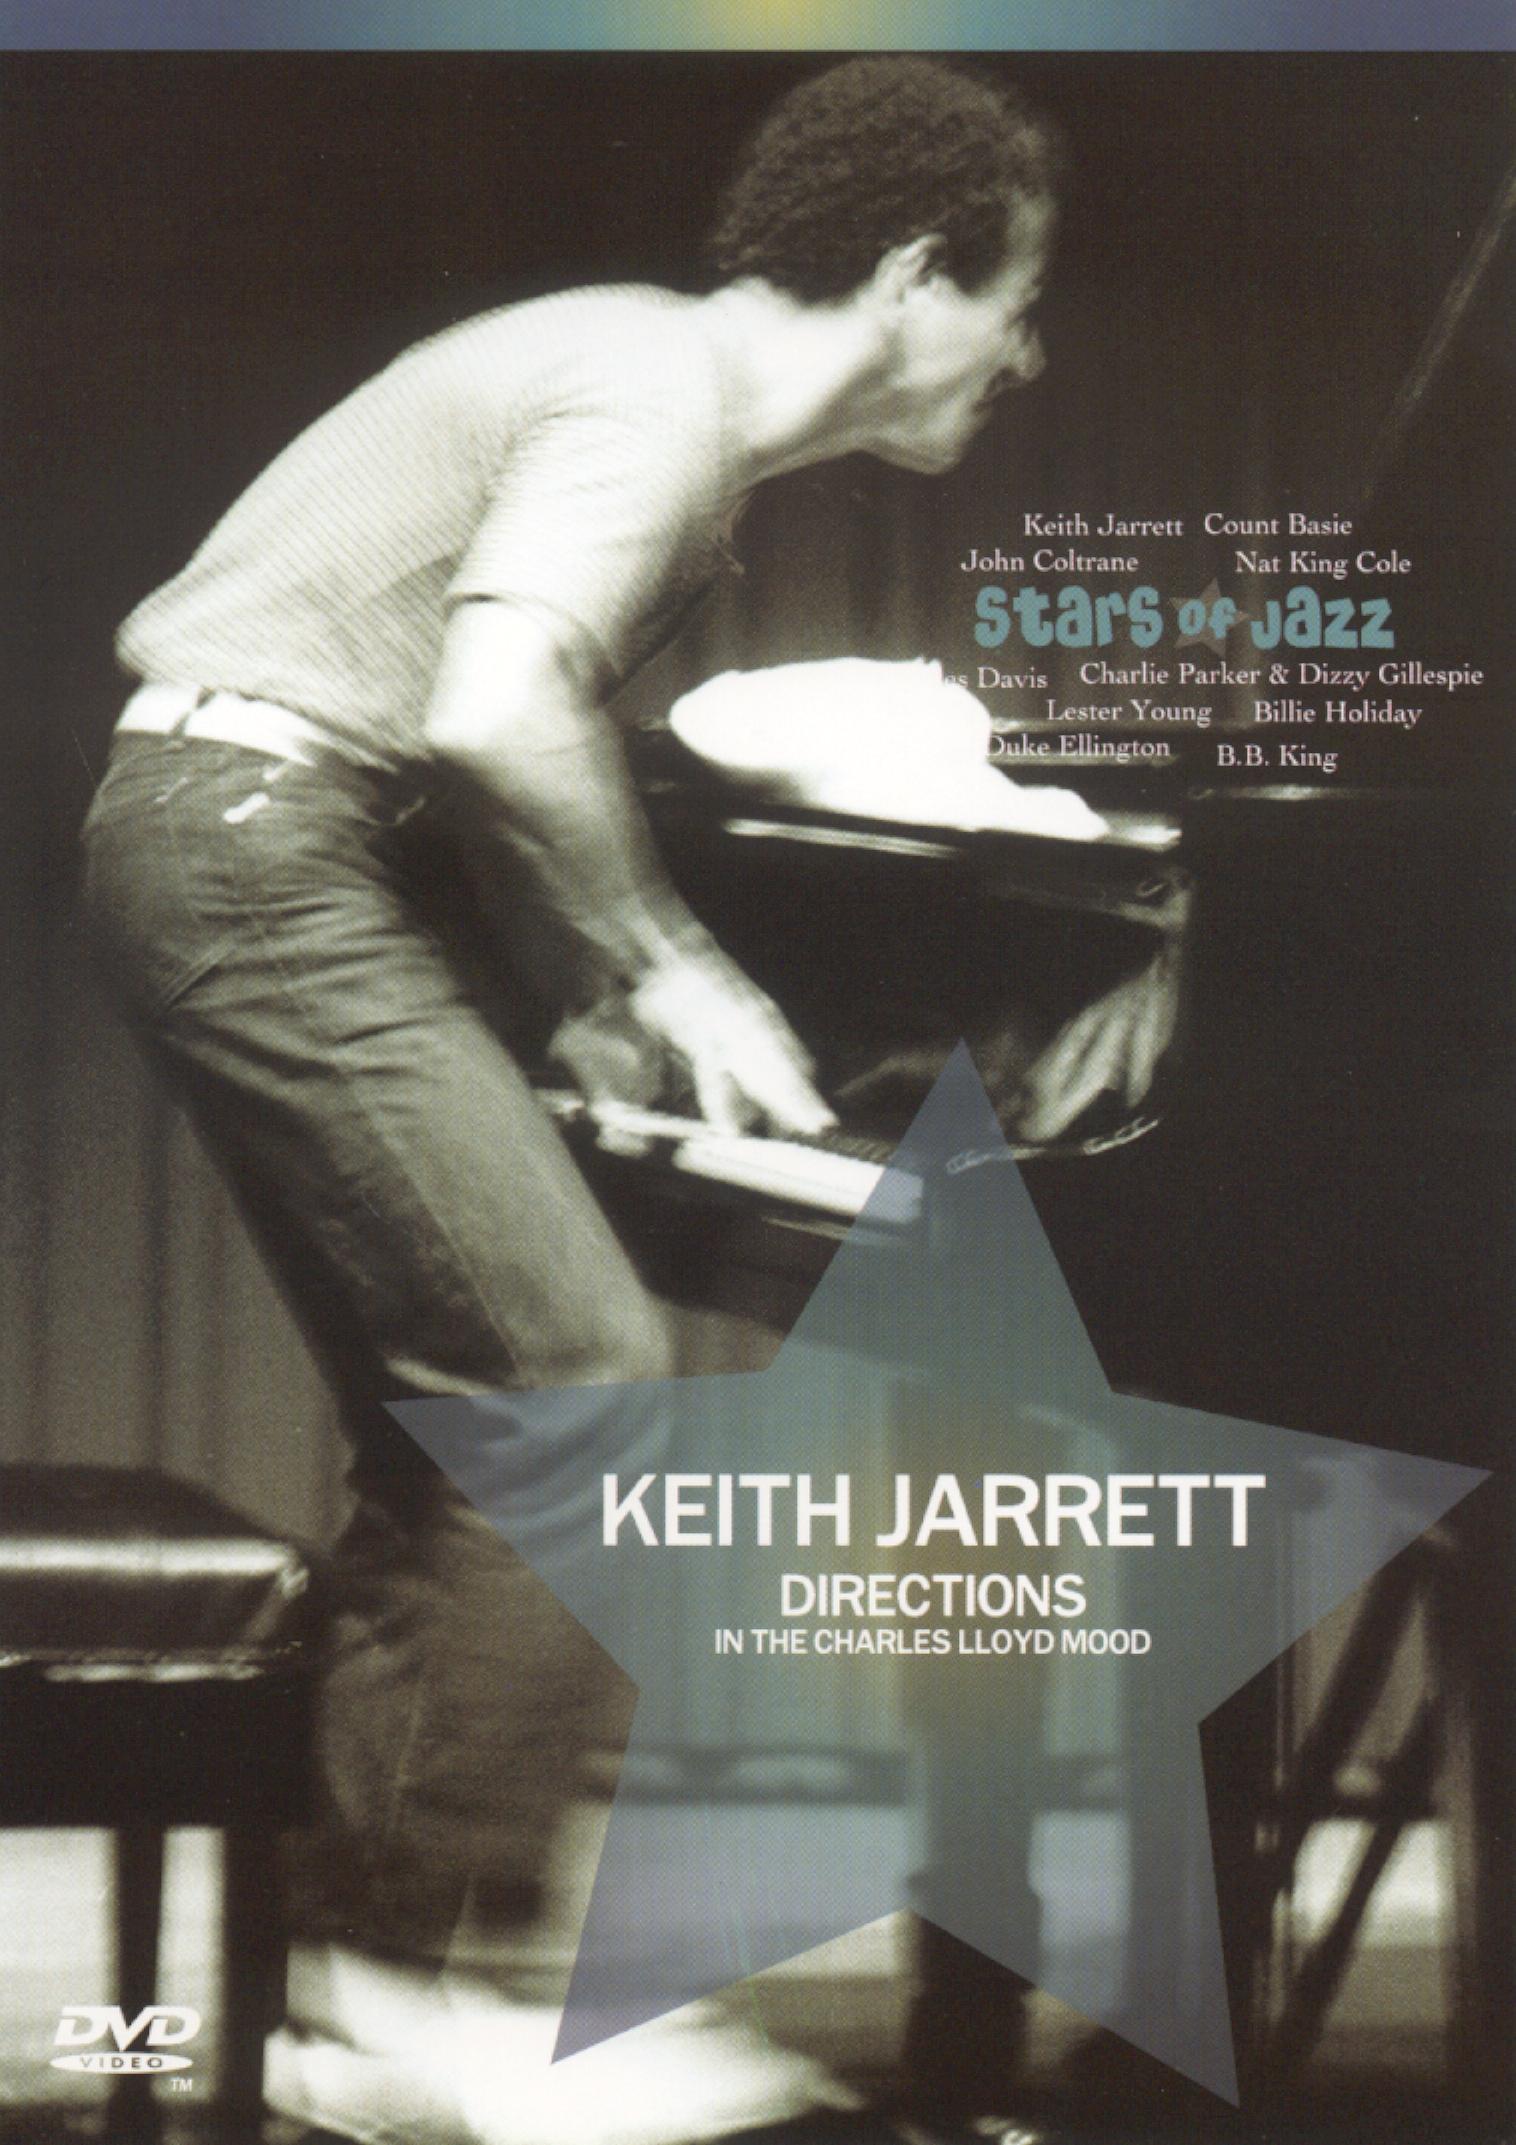 Keith Jarrett: Directions - In the Charles Lloyd Mood